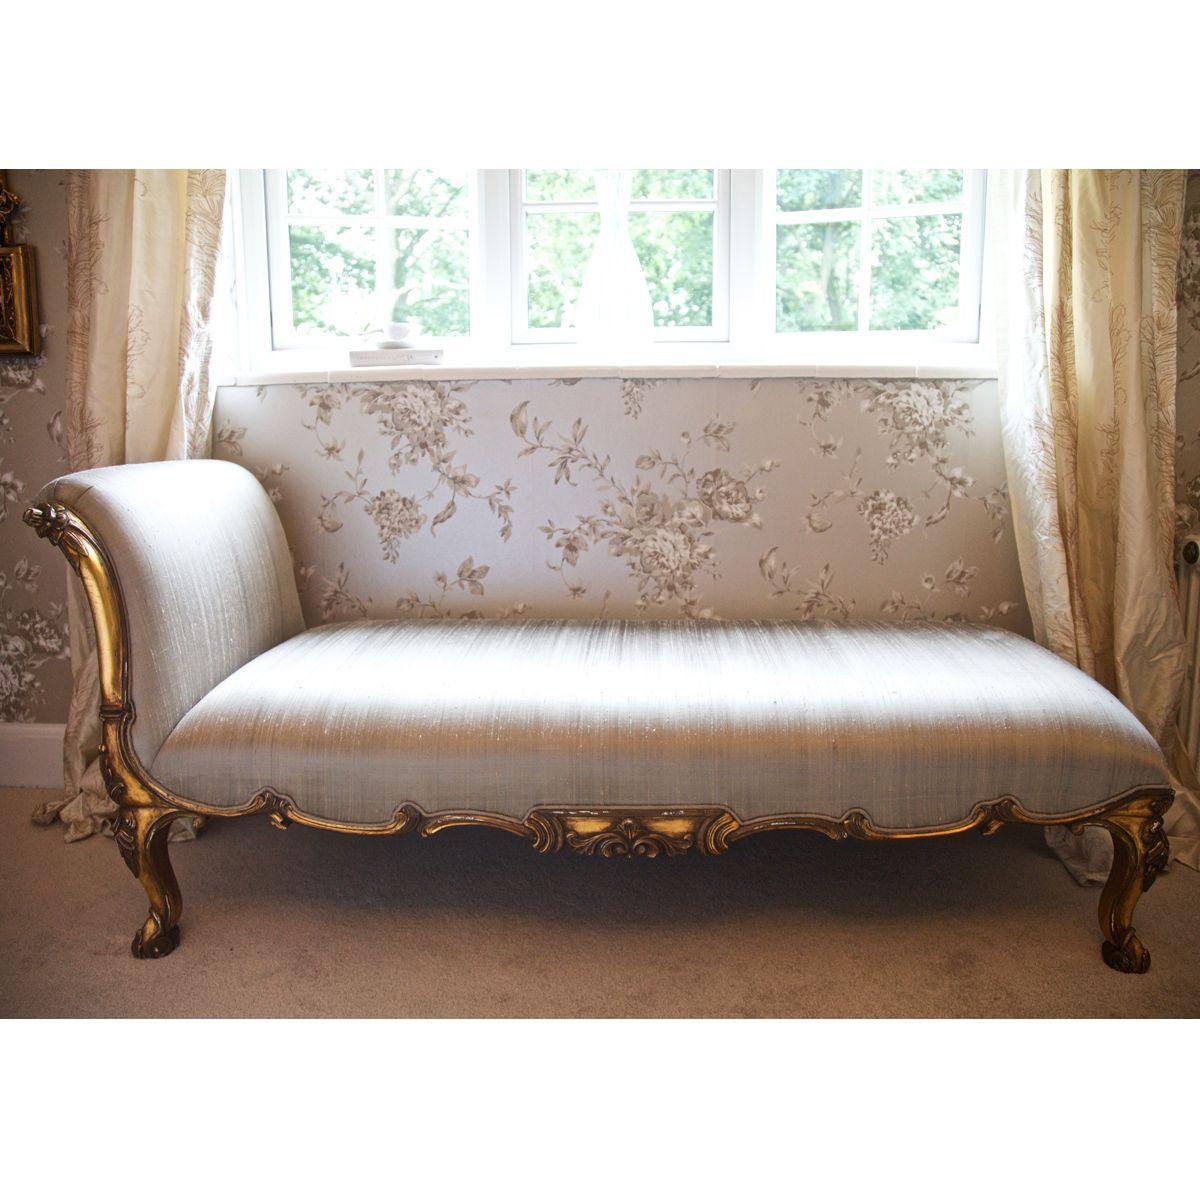 Versailles Gold Chaise Longue (Image 3)